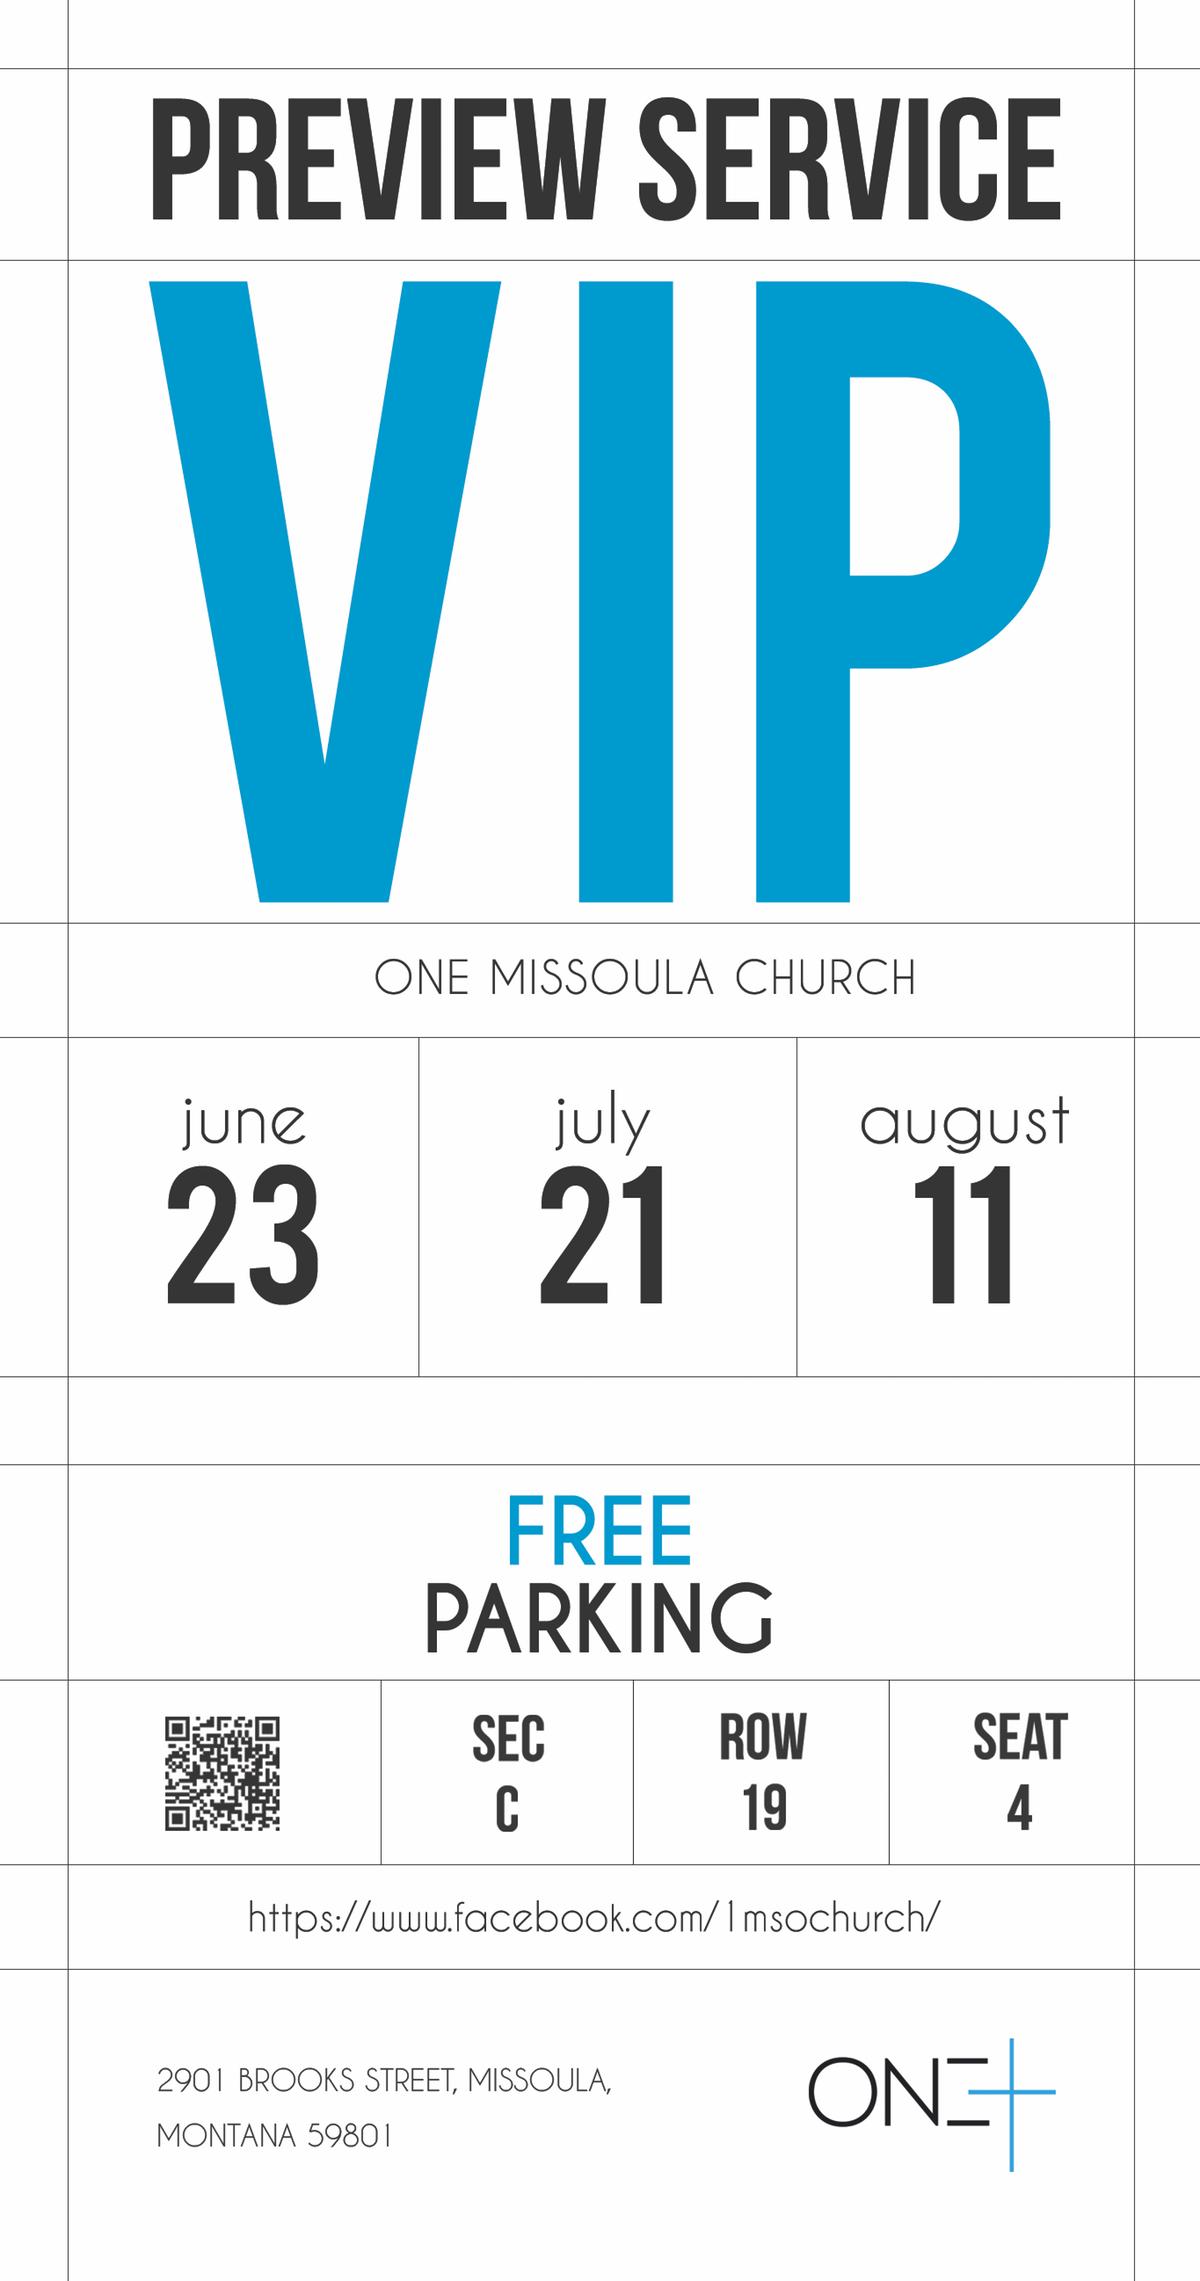 Multipurpose VIP Pass for One Missoula